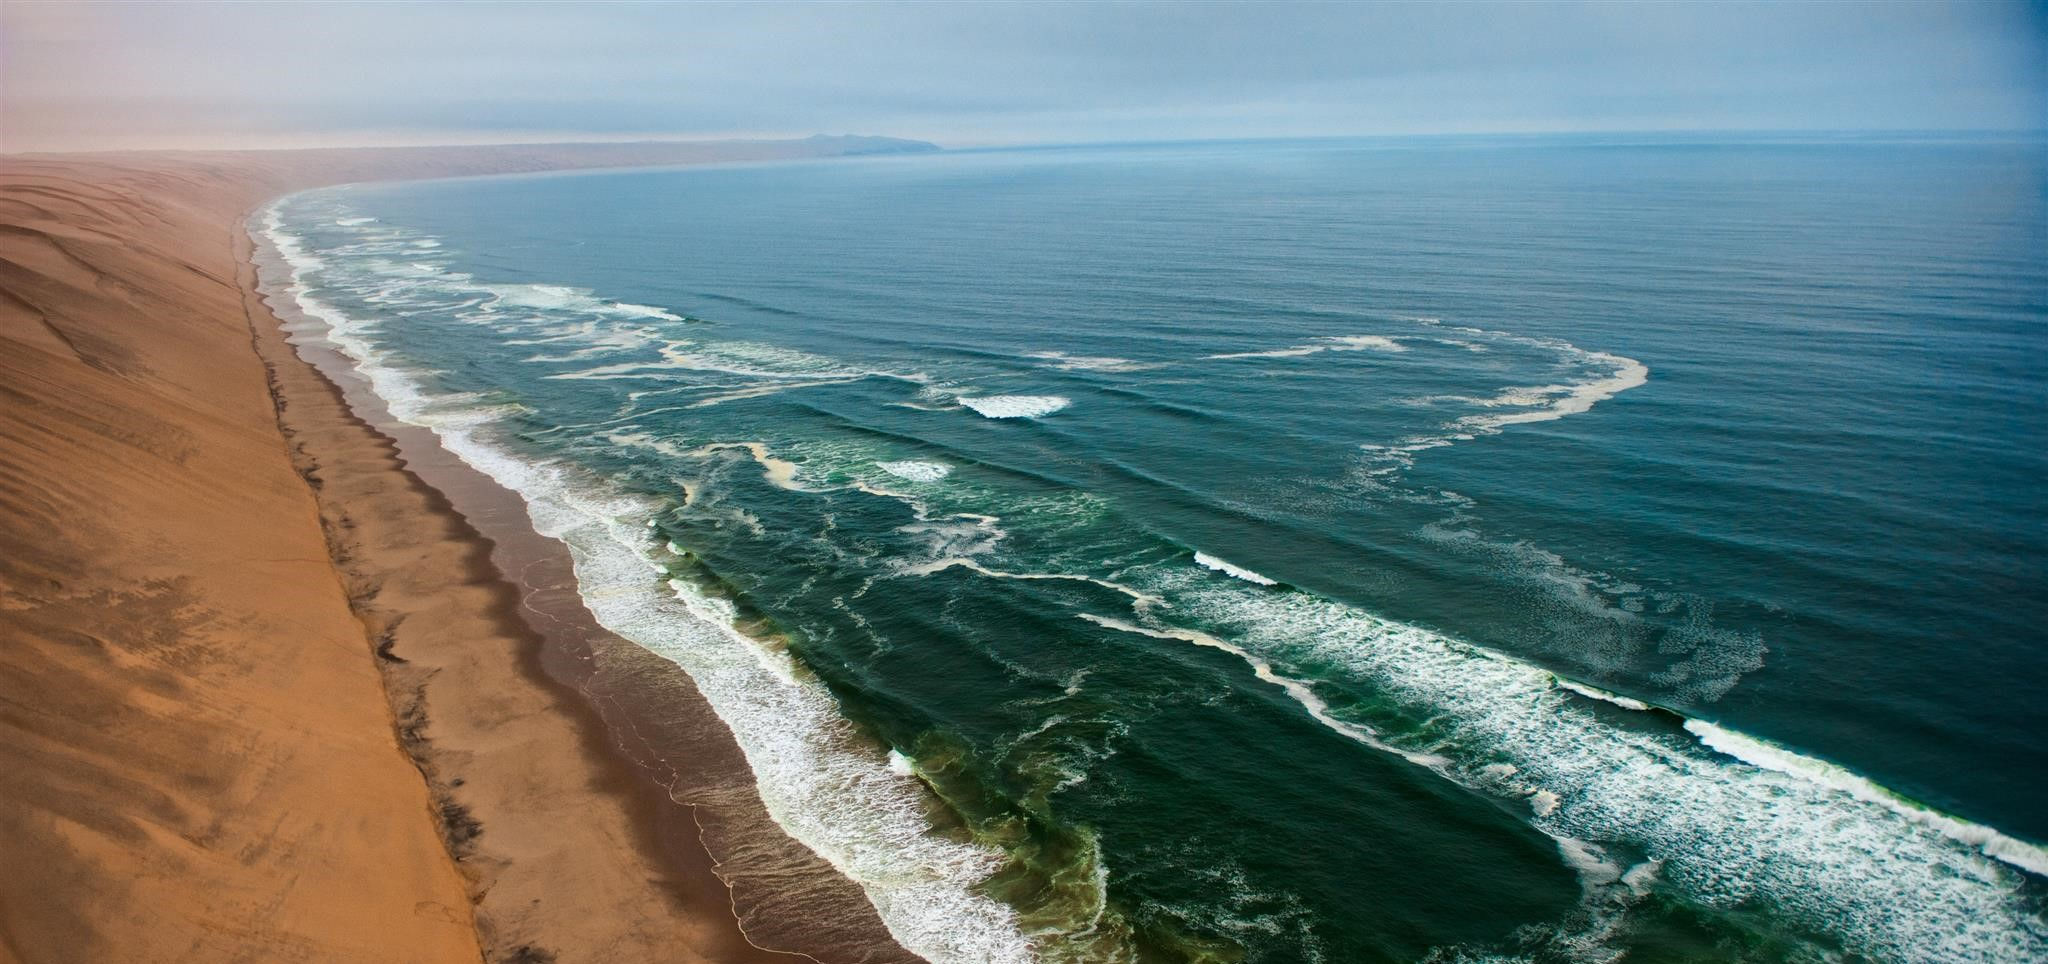 coast - photo #38